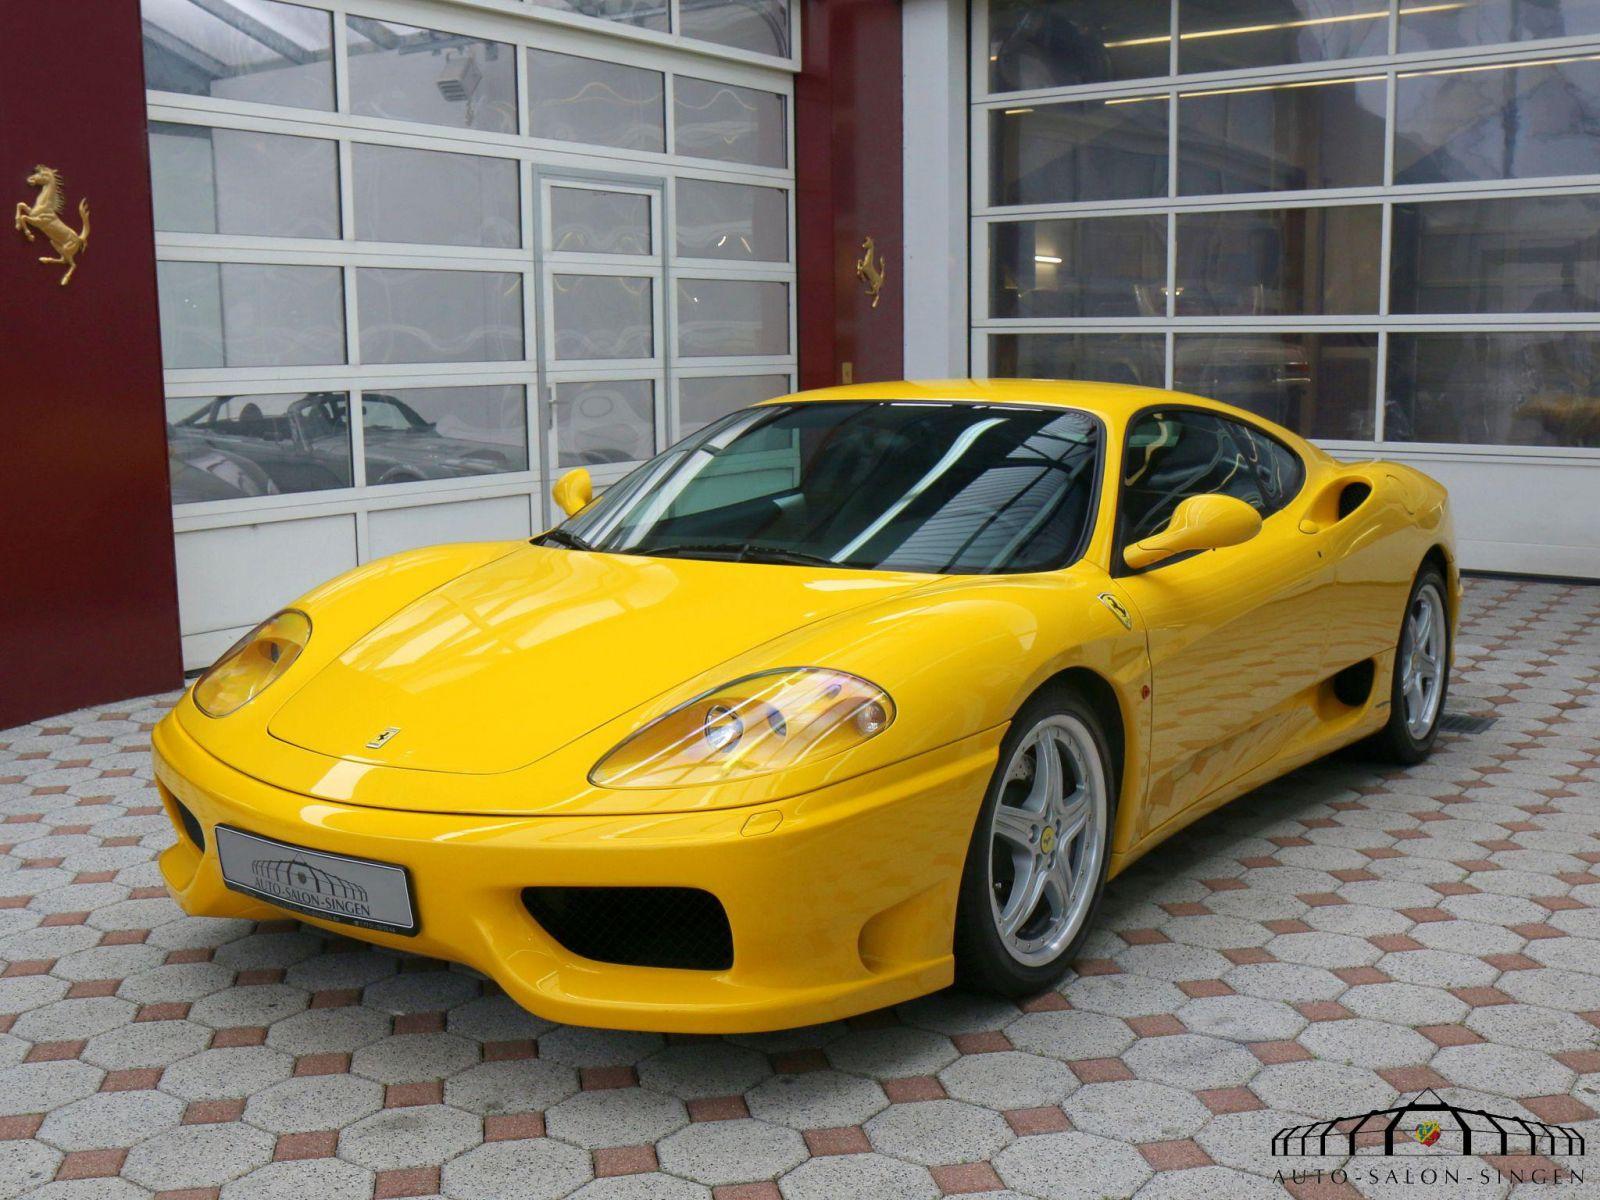 Ferrari 360 Modena Coupé Auto Salon Singen